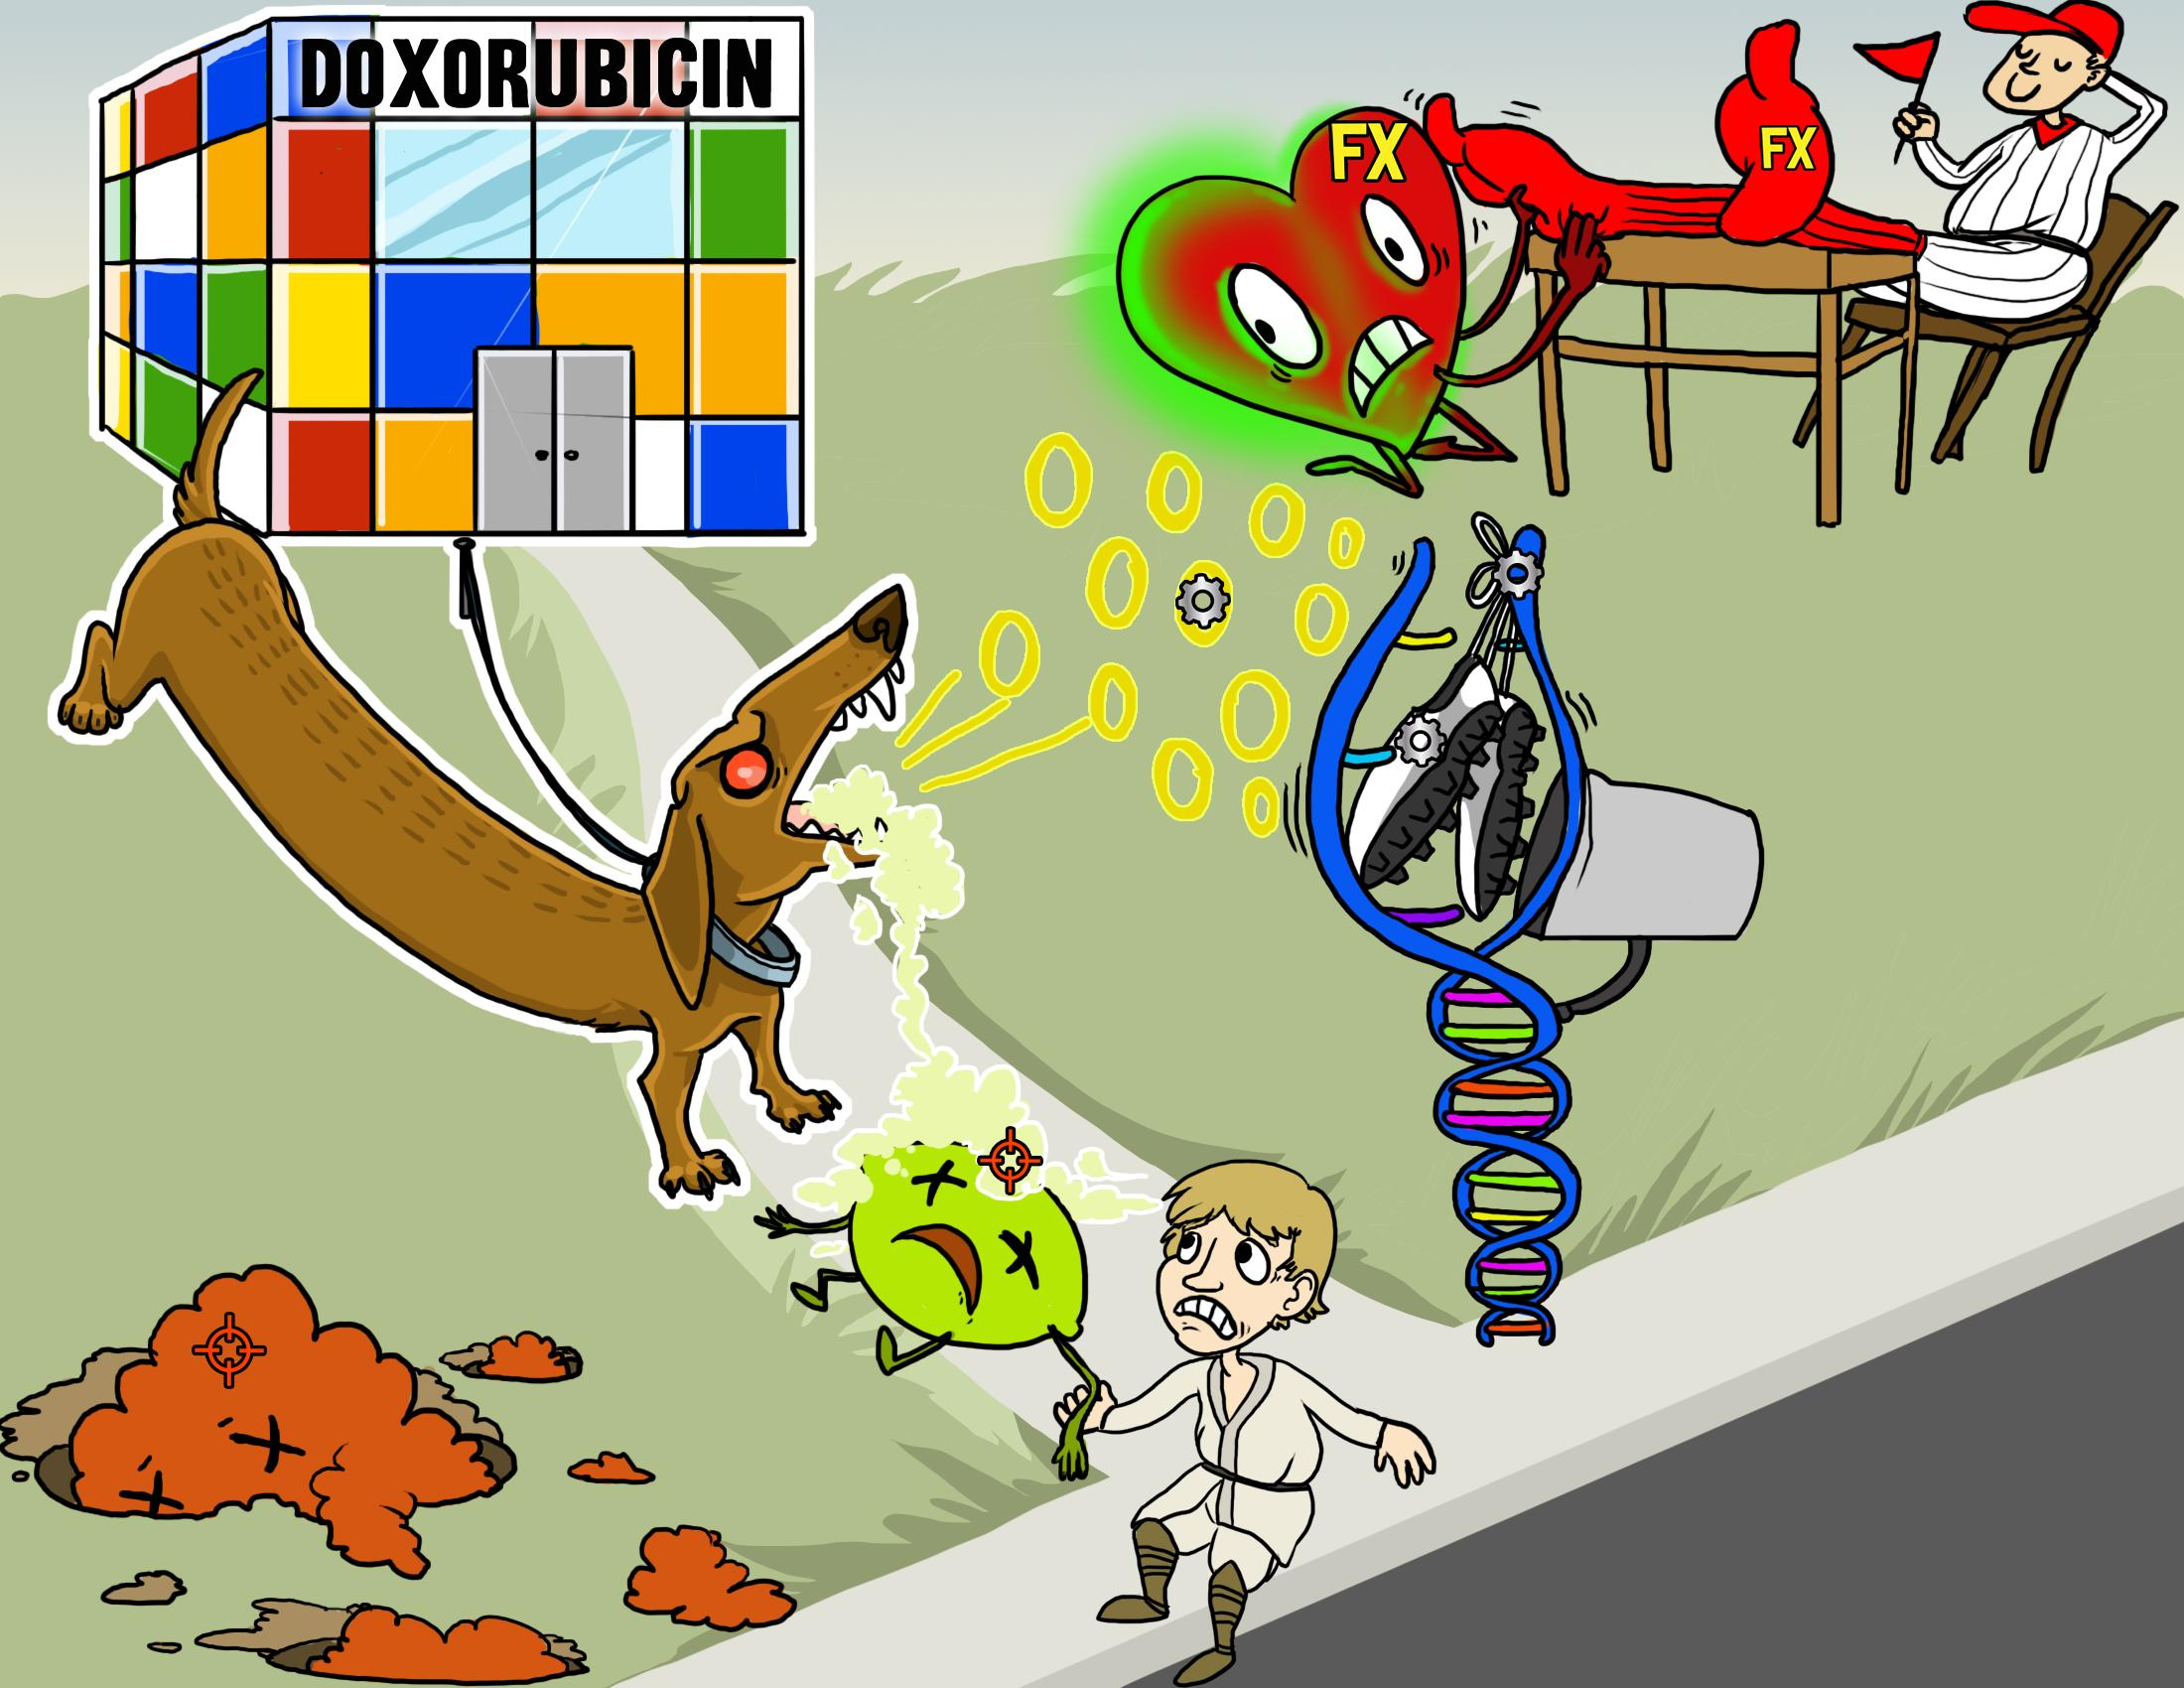 Doxorubicin (Adriamycin)